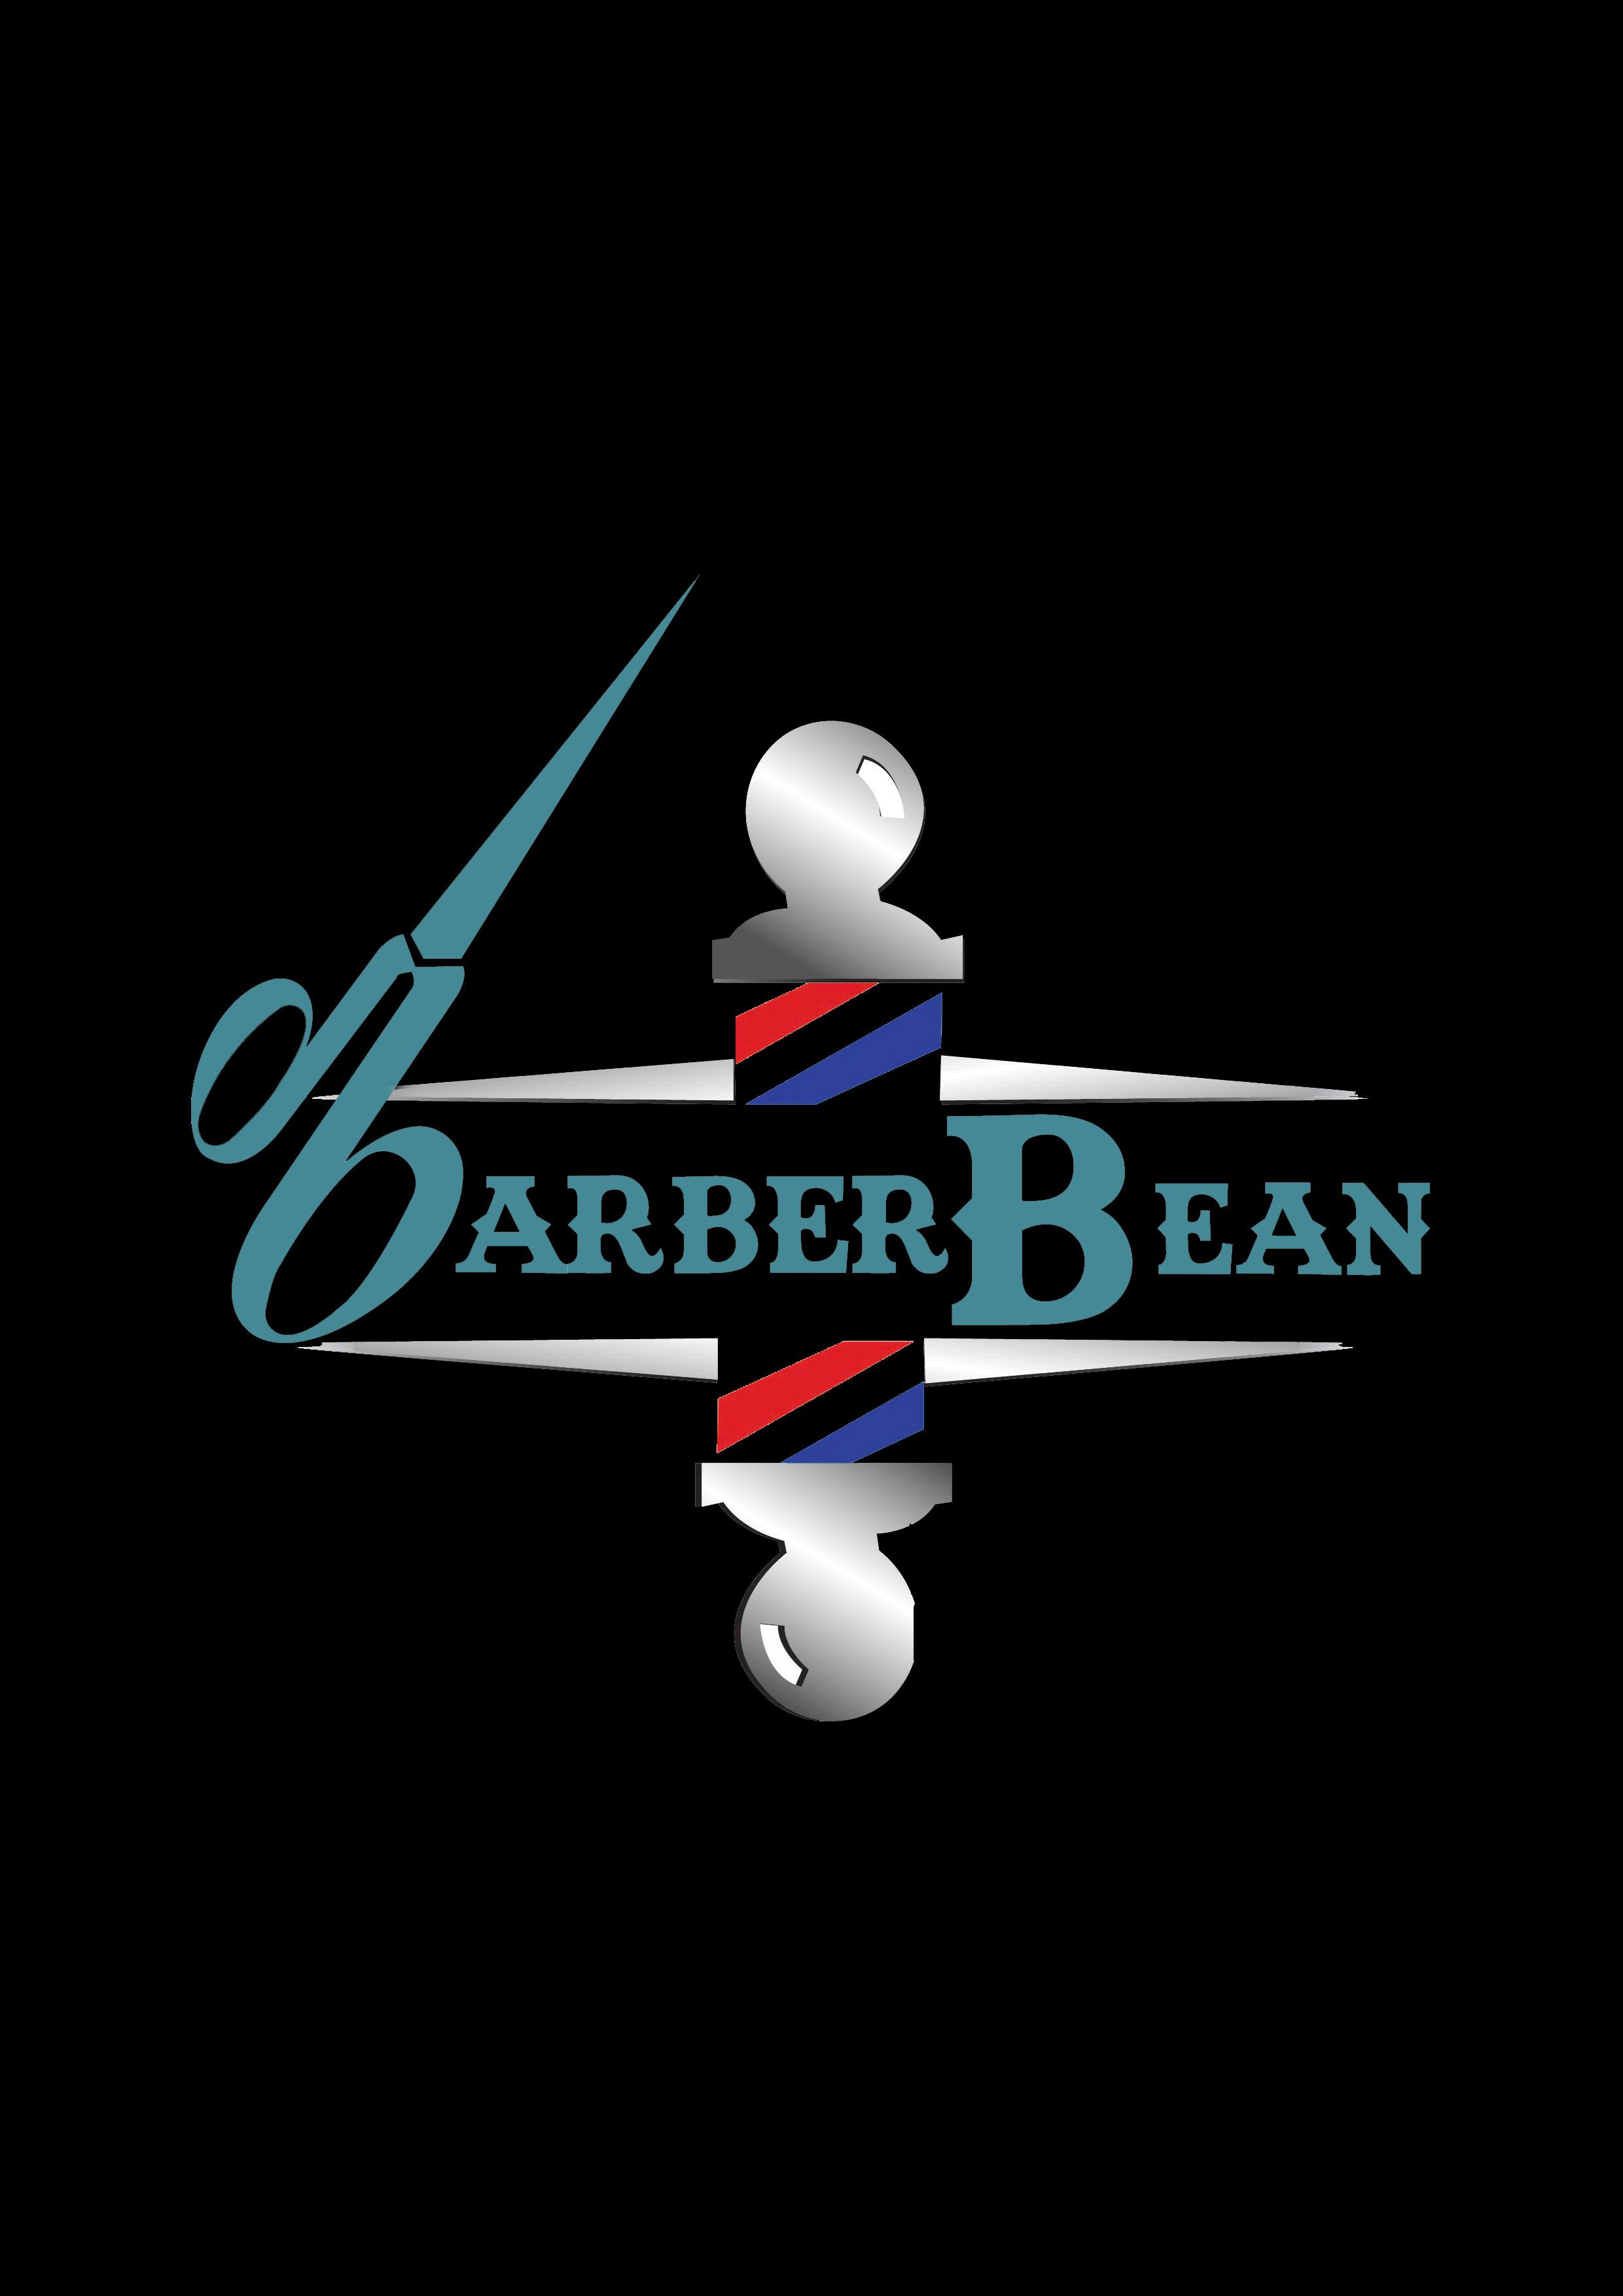 barberbean on One Bite Pizza App